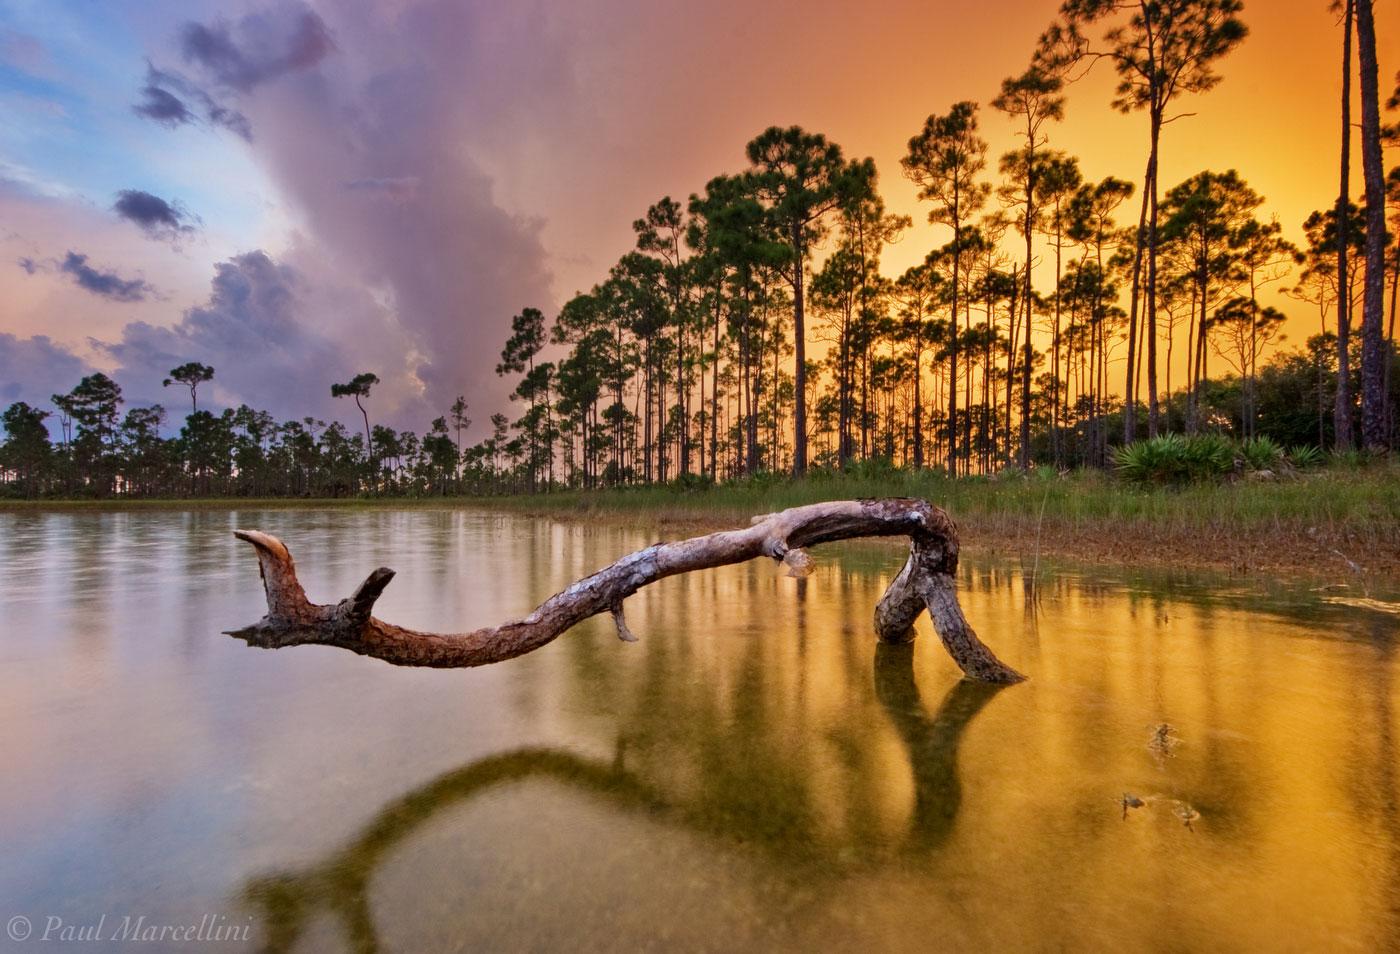 pine, sunset, storm, everglades, Florida, limited edition, nature, photography, florida national parks, photo